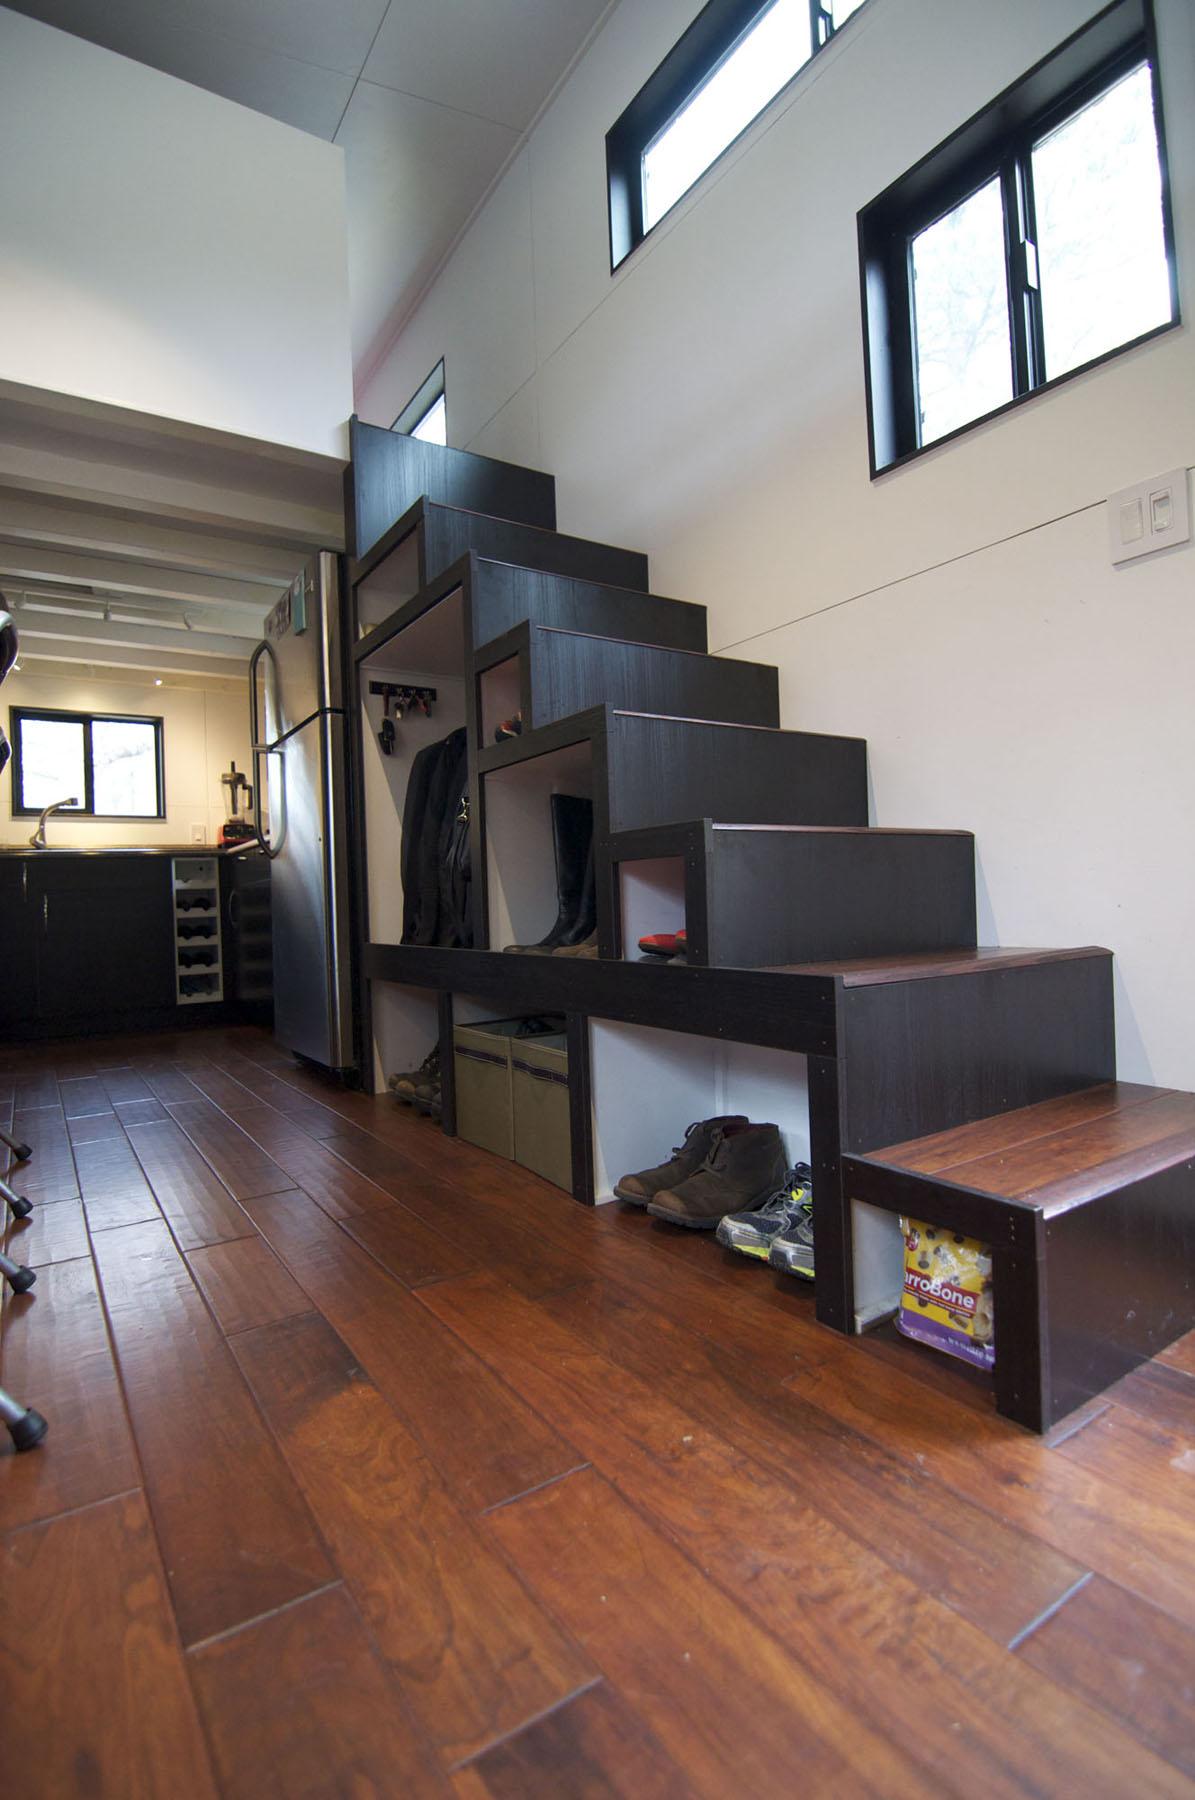 Fullsize Of Tiny House Stairs